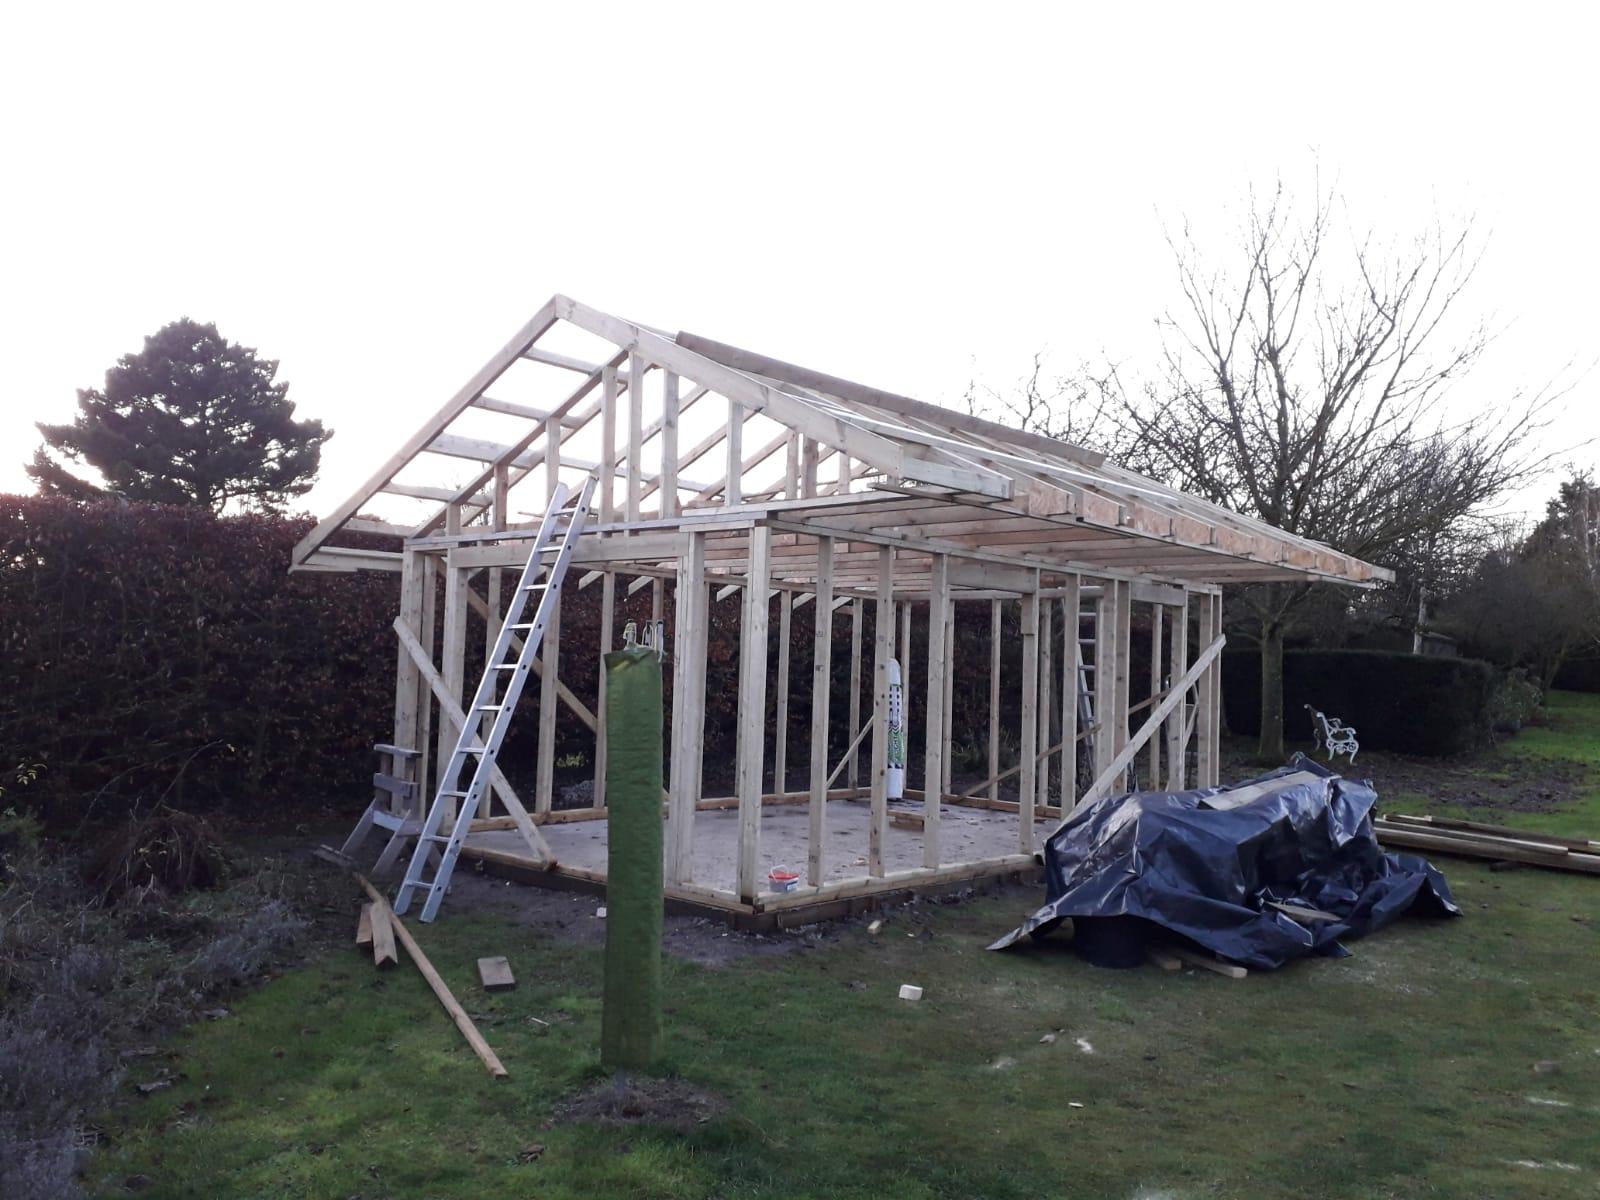 Timber frame under construction